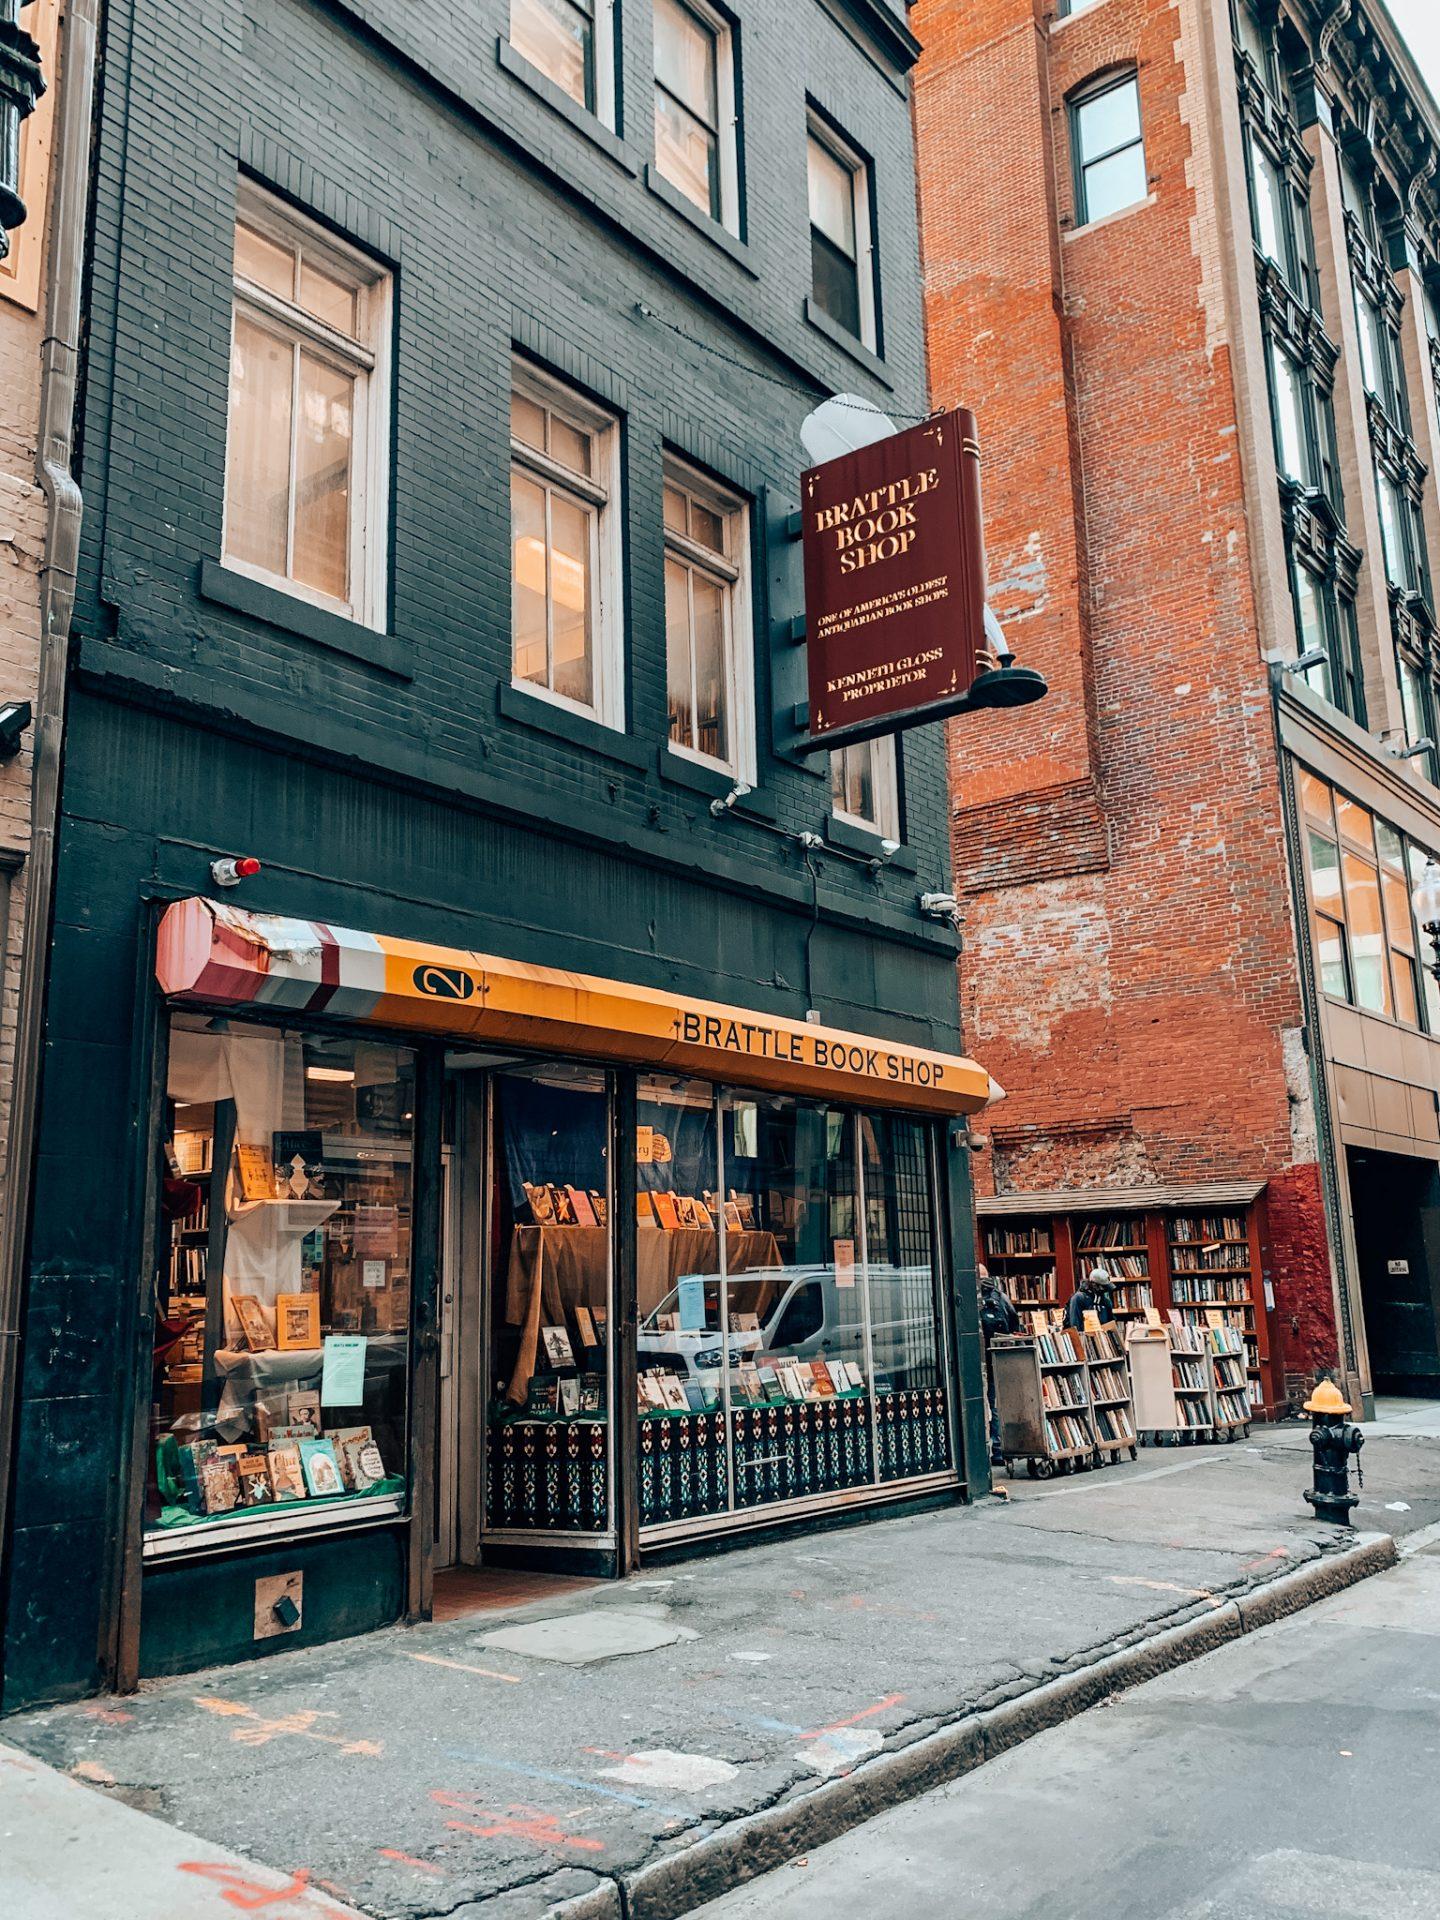 Brattle Bookshop in Boston, MA